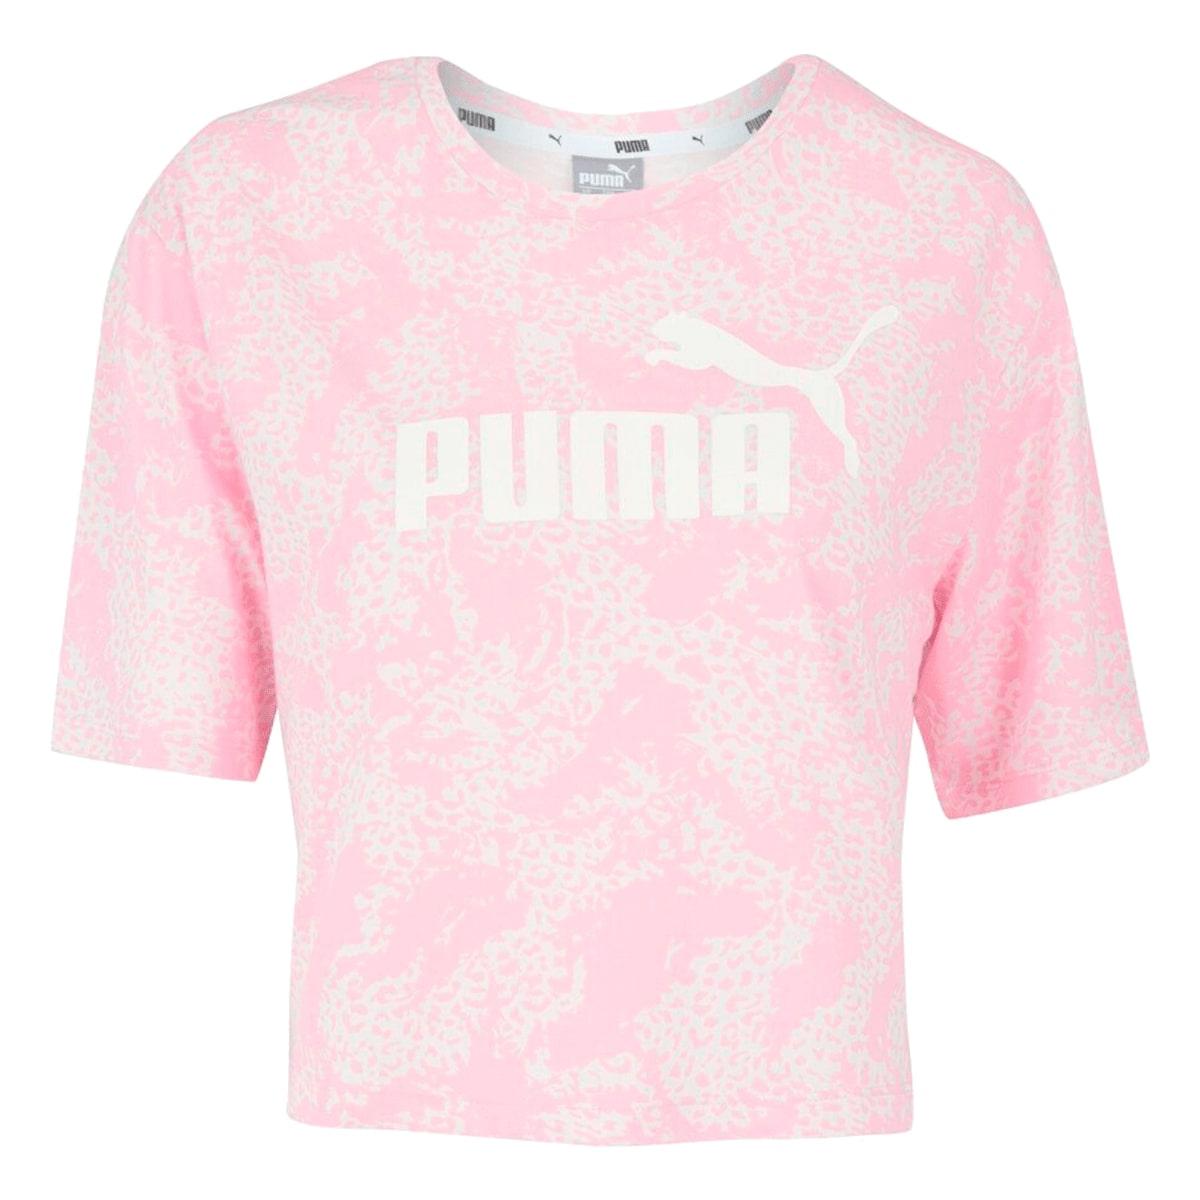 Blusa Cropped Puma Elevated ESS AOP Feminino Rosa